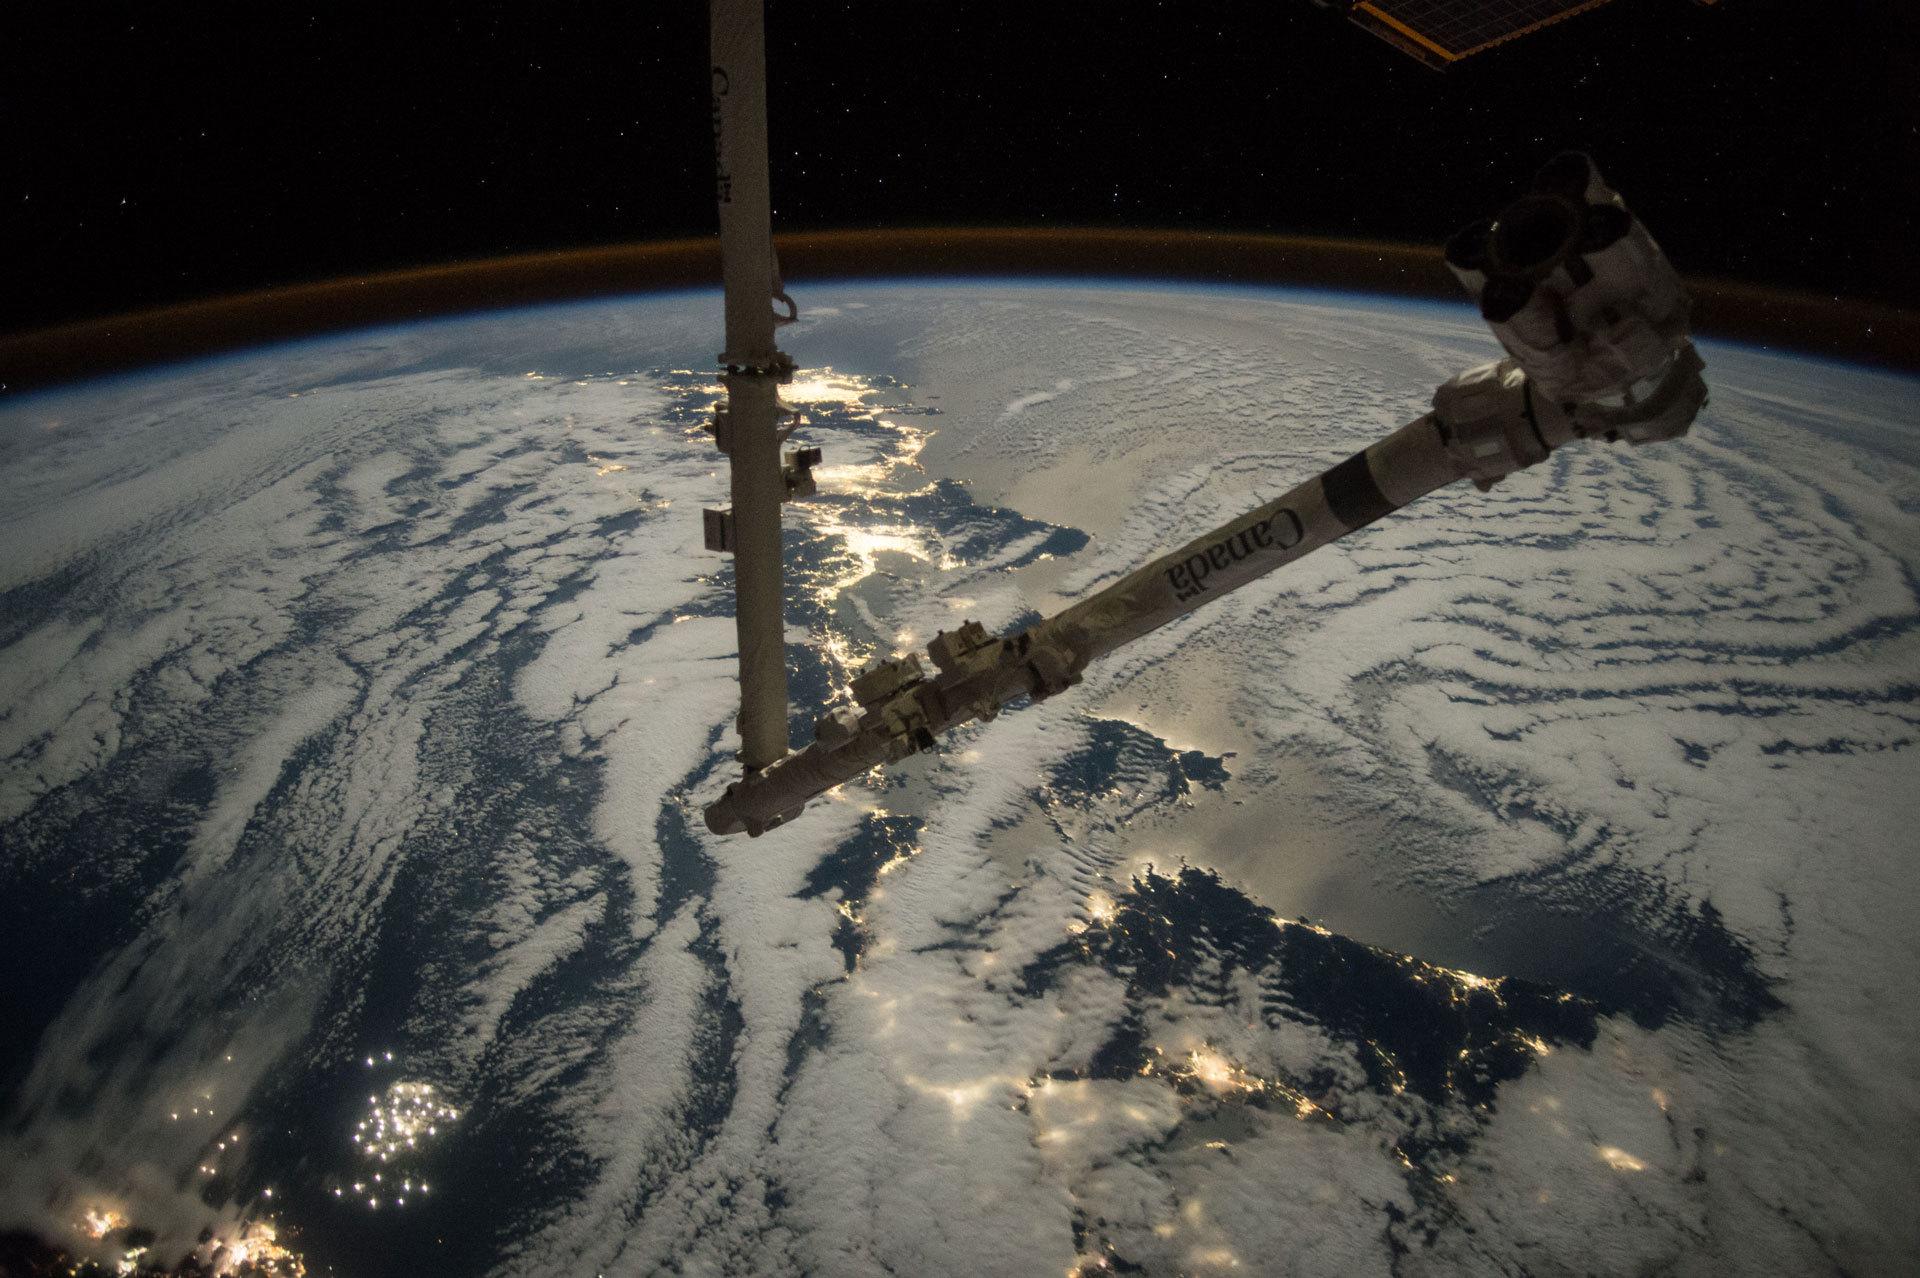 Cygnus CRS Orb-4 отправился к МКС - 2